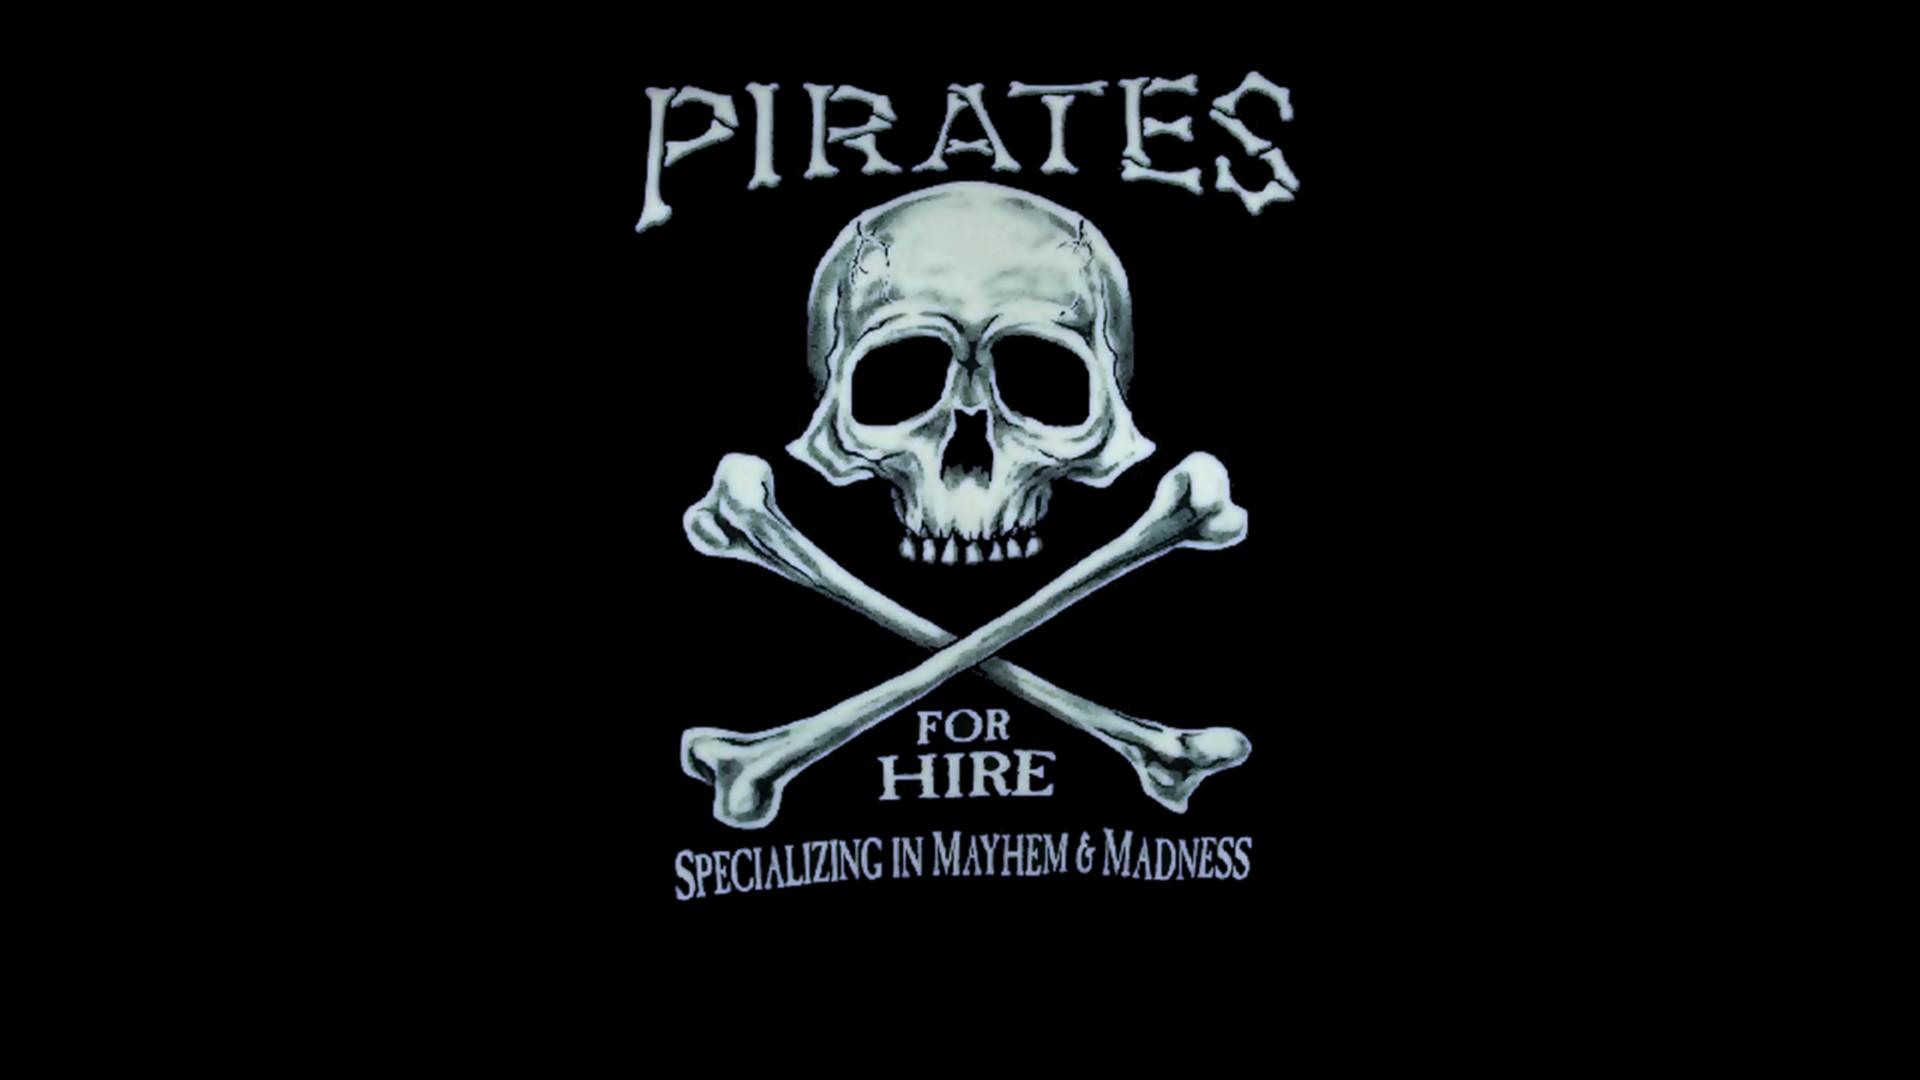 … free pittsburgh pirates wallpaper wallpapersafari …